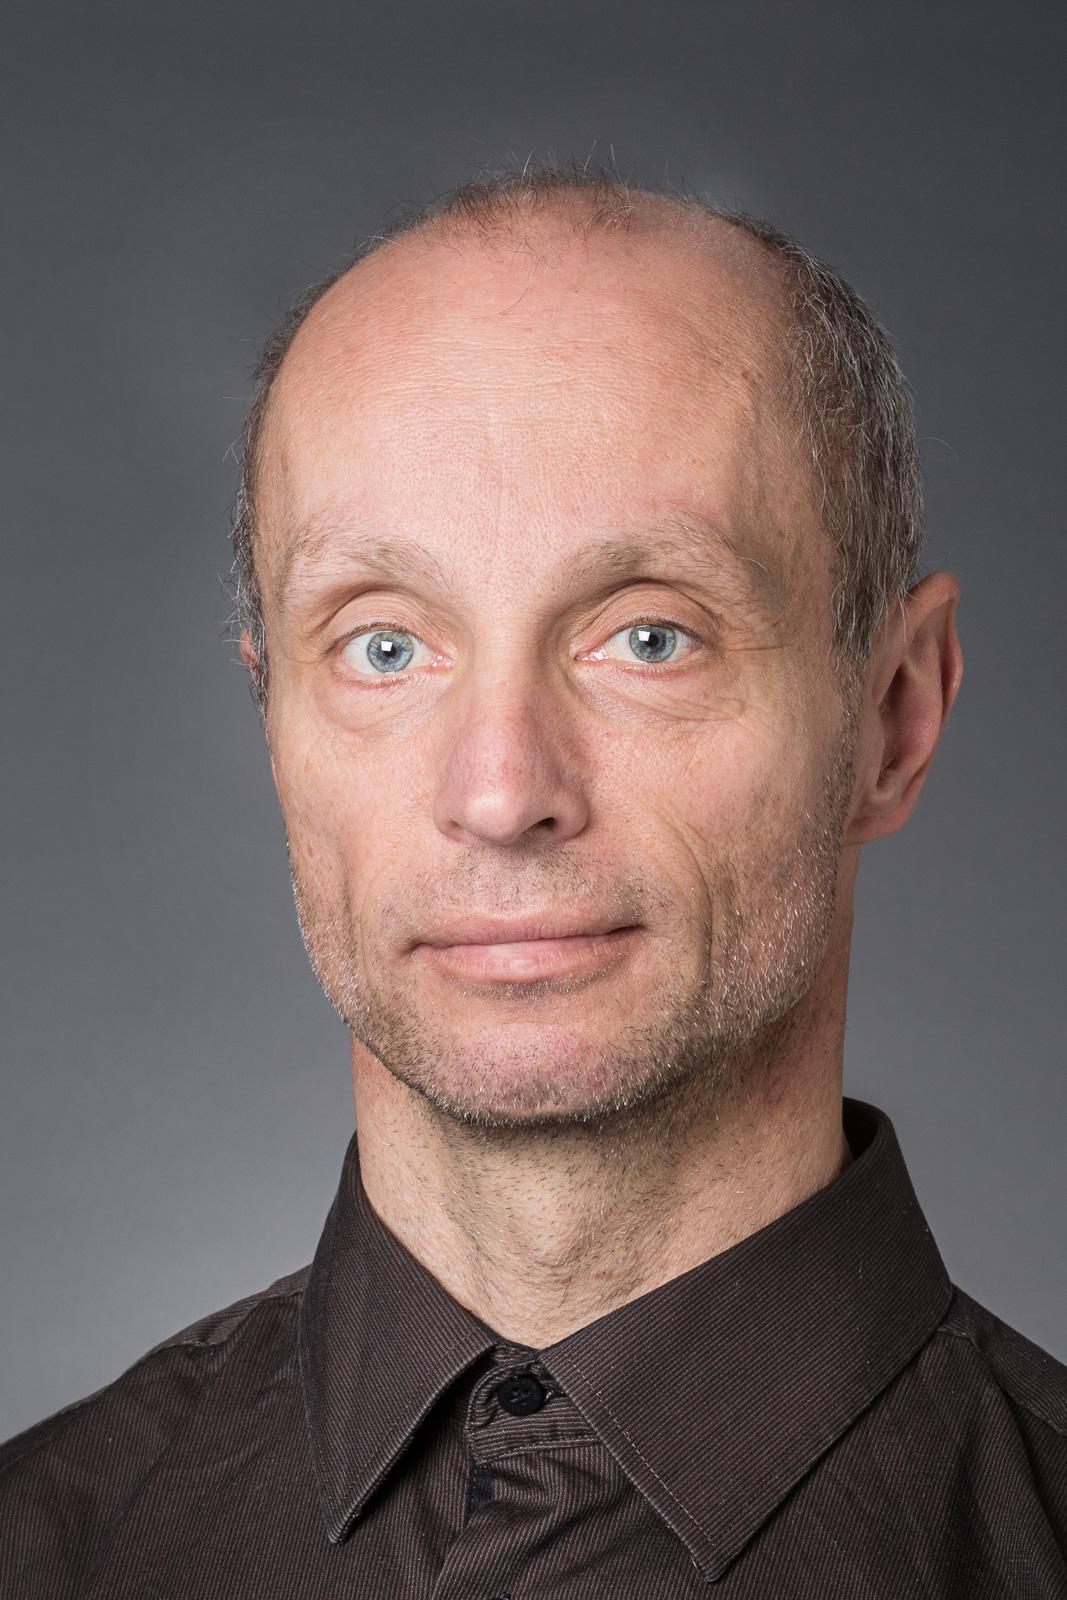 Henrik Tvermoes